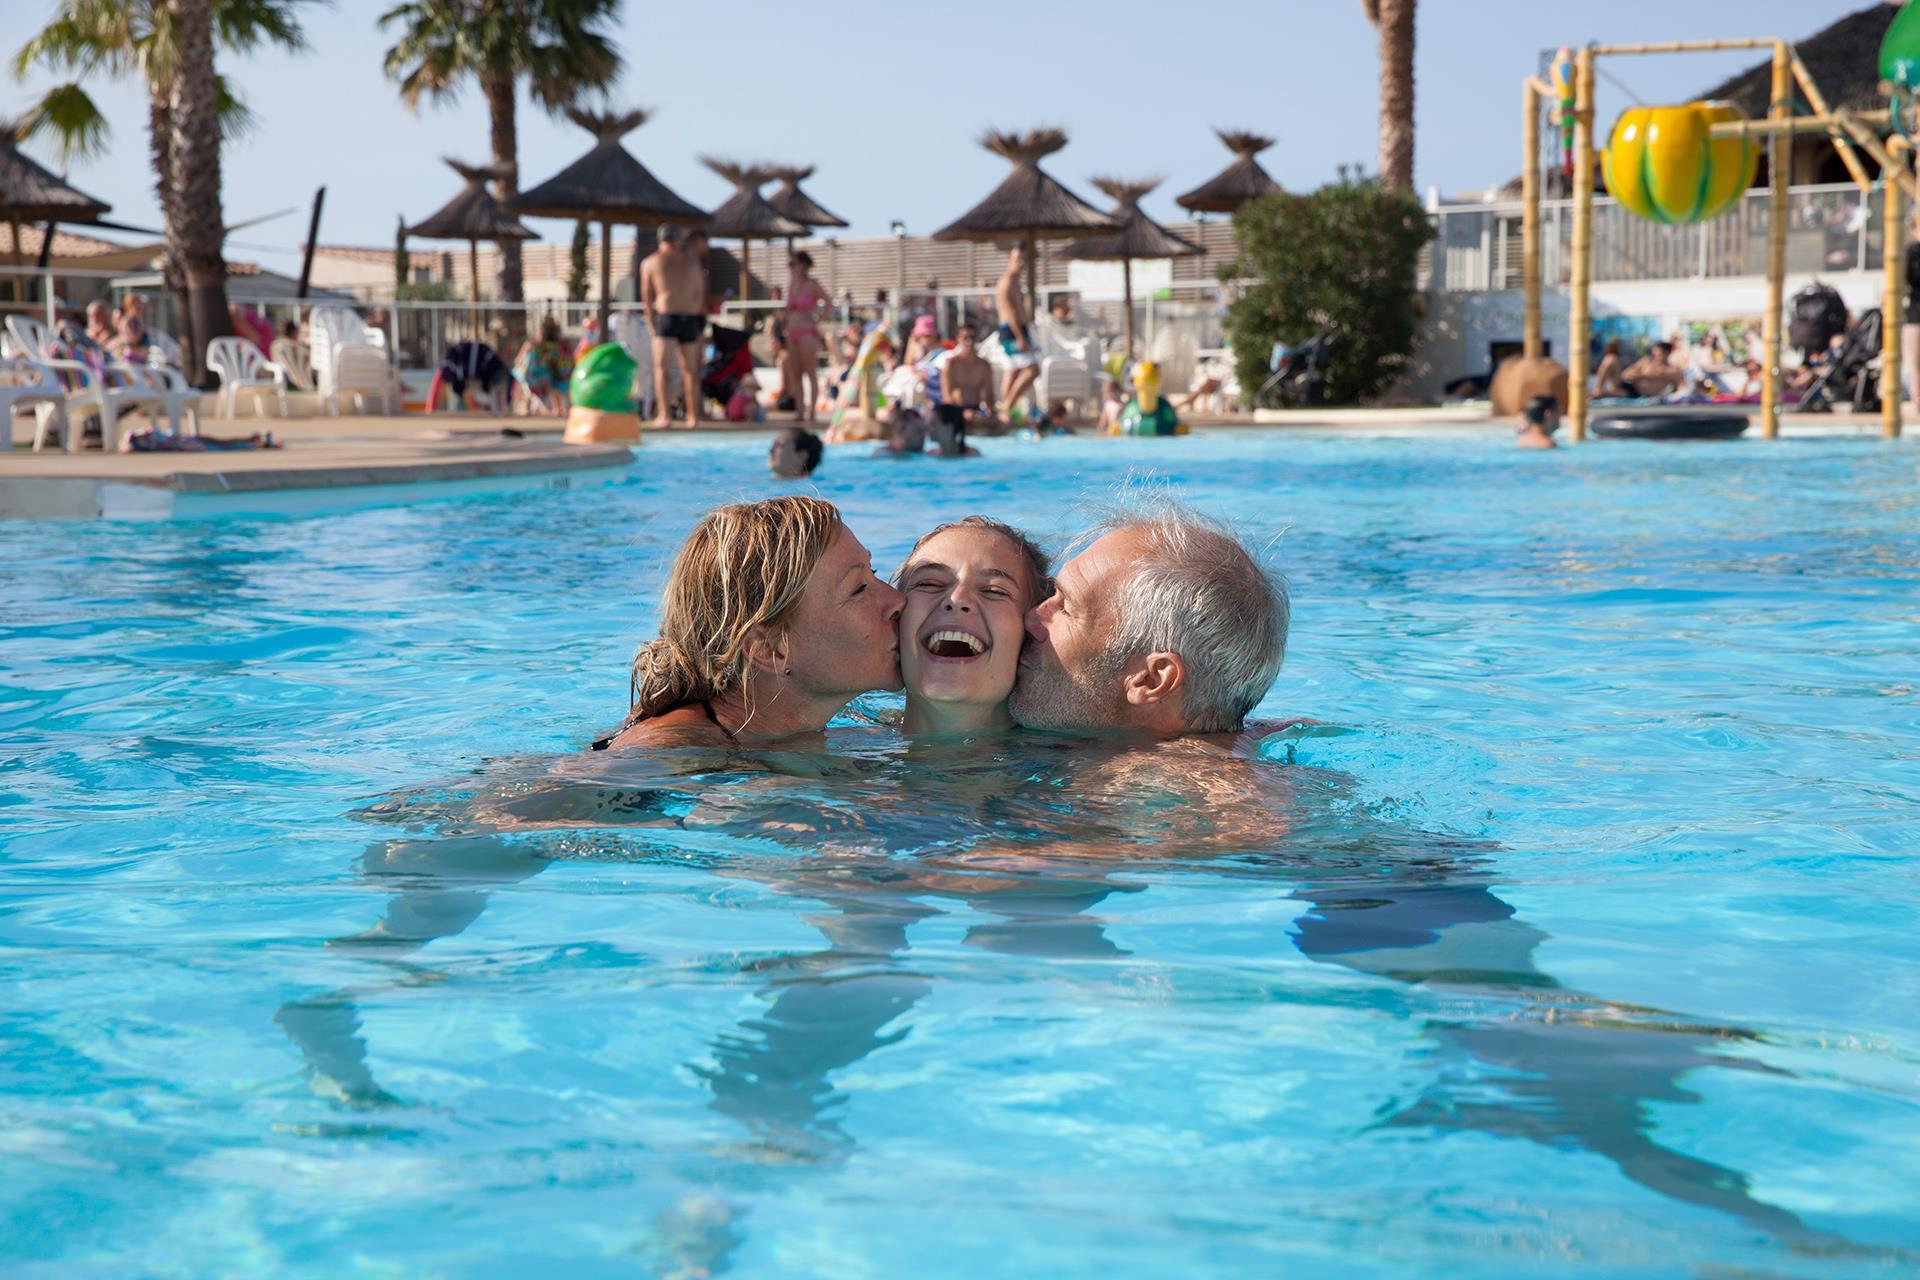 Swimming Pool Family Pool Parasols Palm Trees